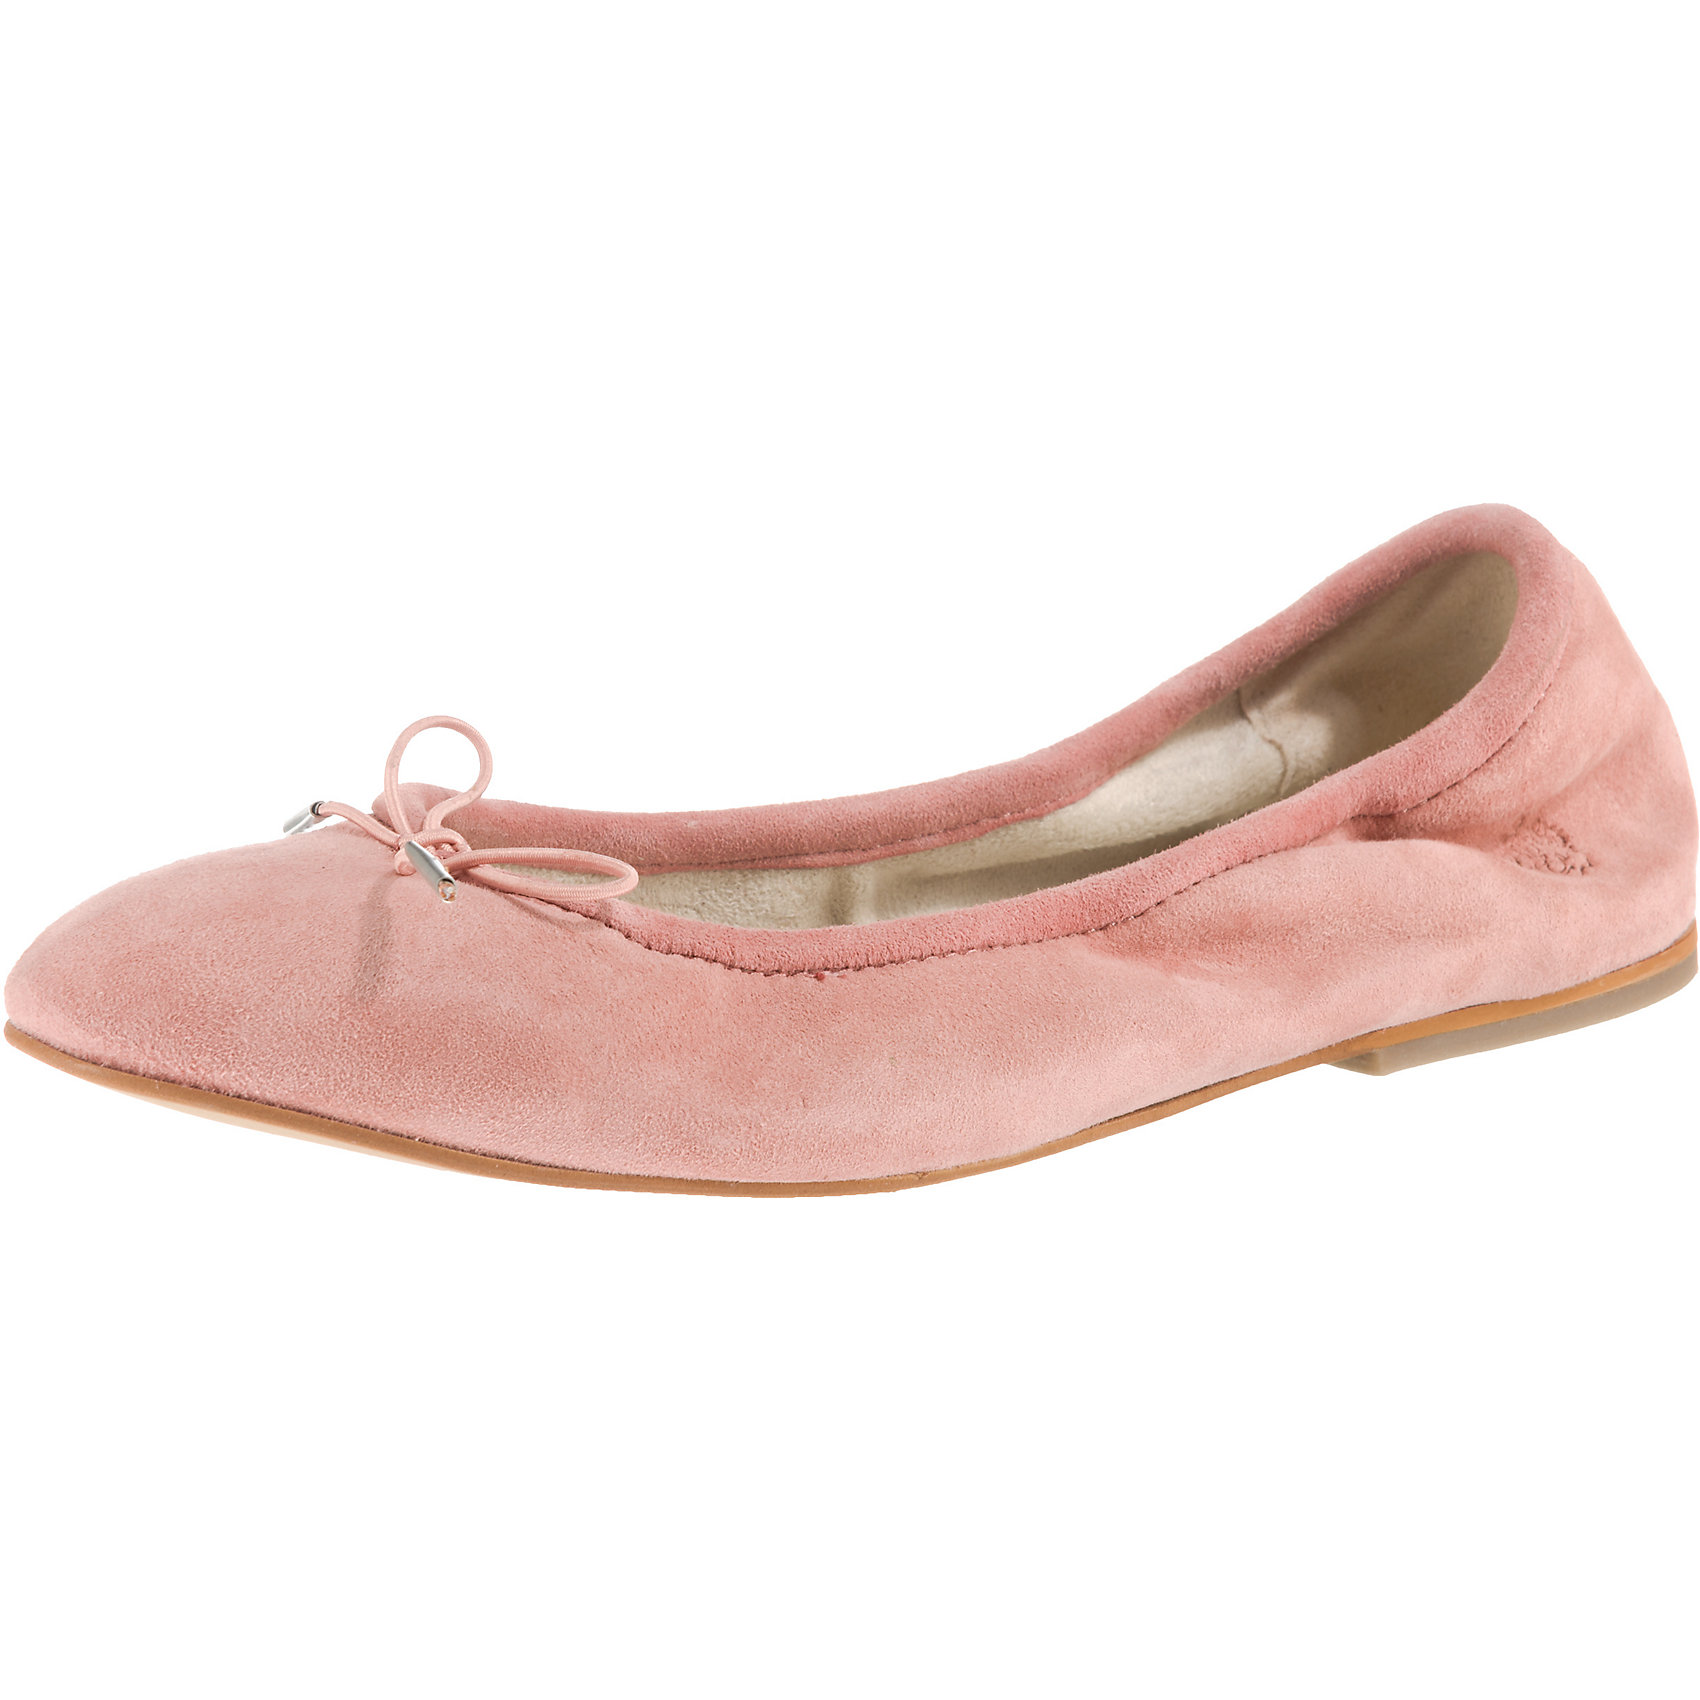 Neu Apple of Eden Ballerinas LIZ Klassische Ballerinas Eden 7386215 für Damen 6ee110